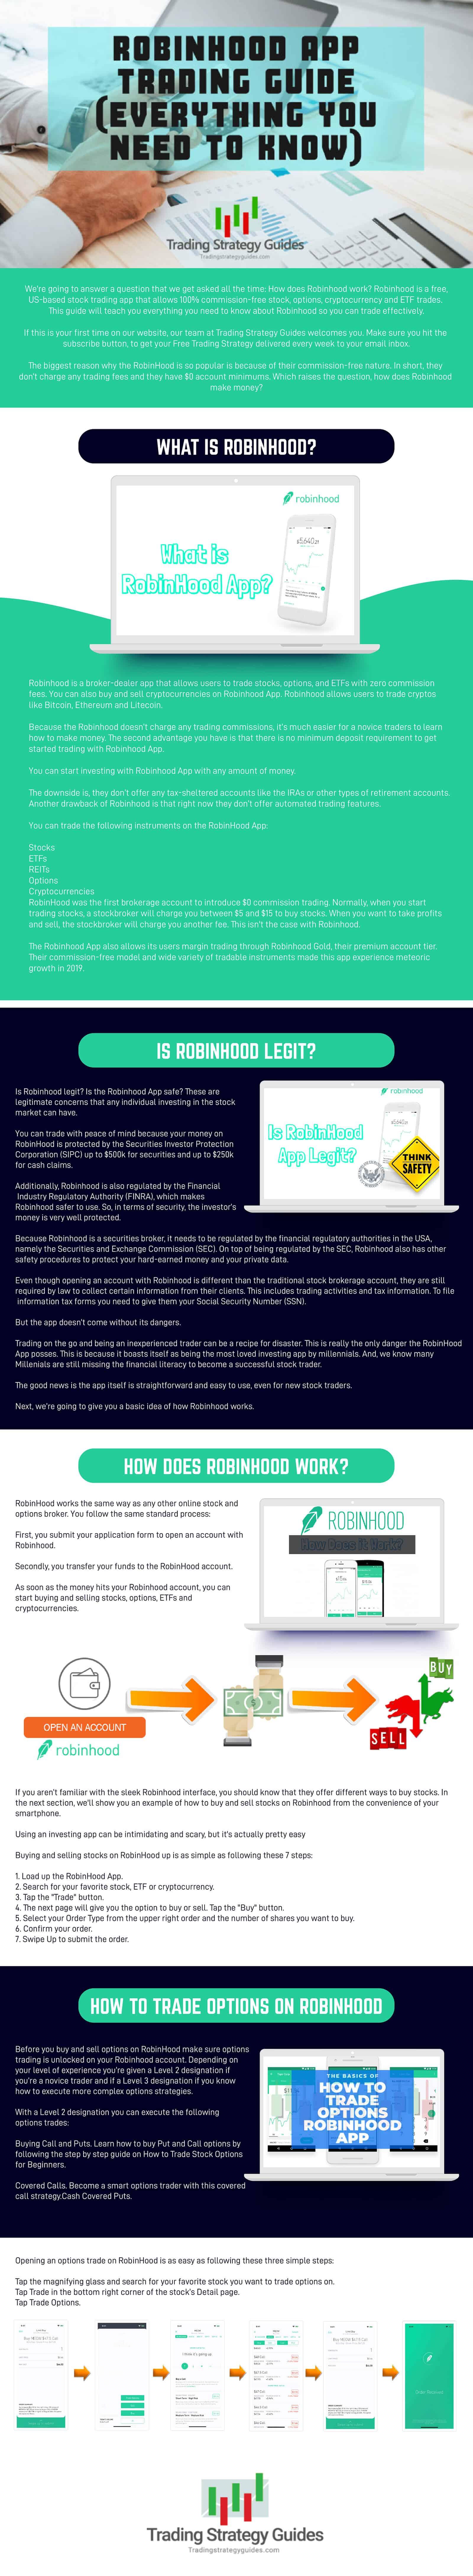 what is robinhood app